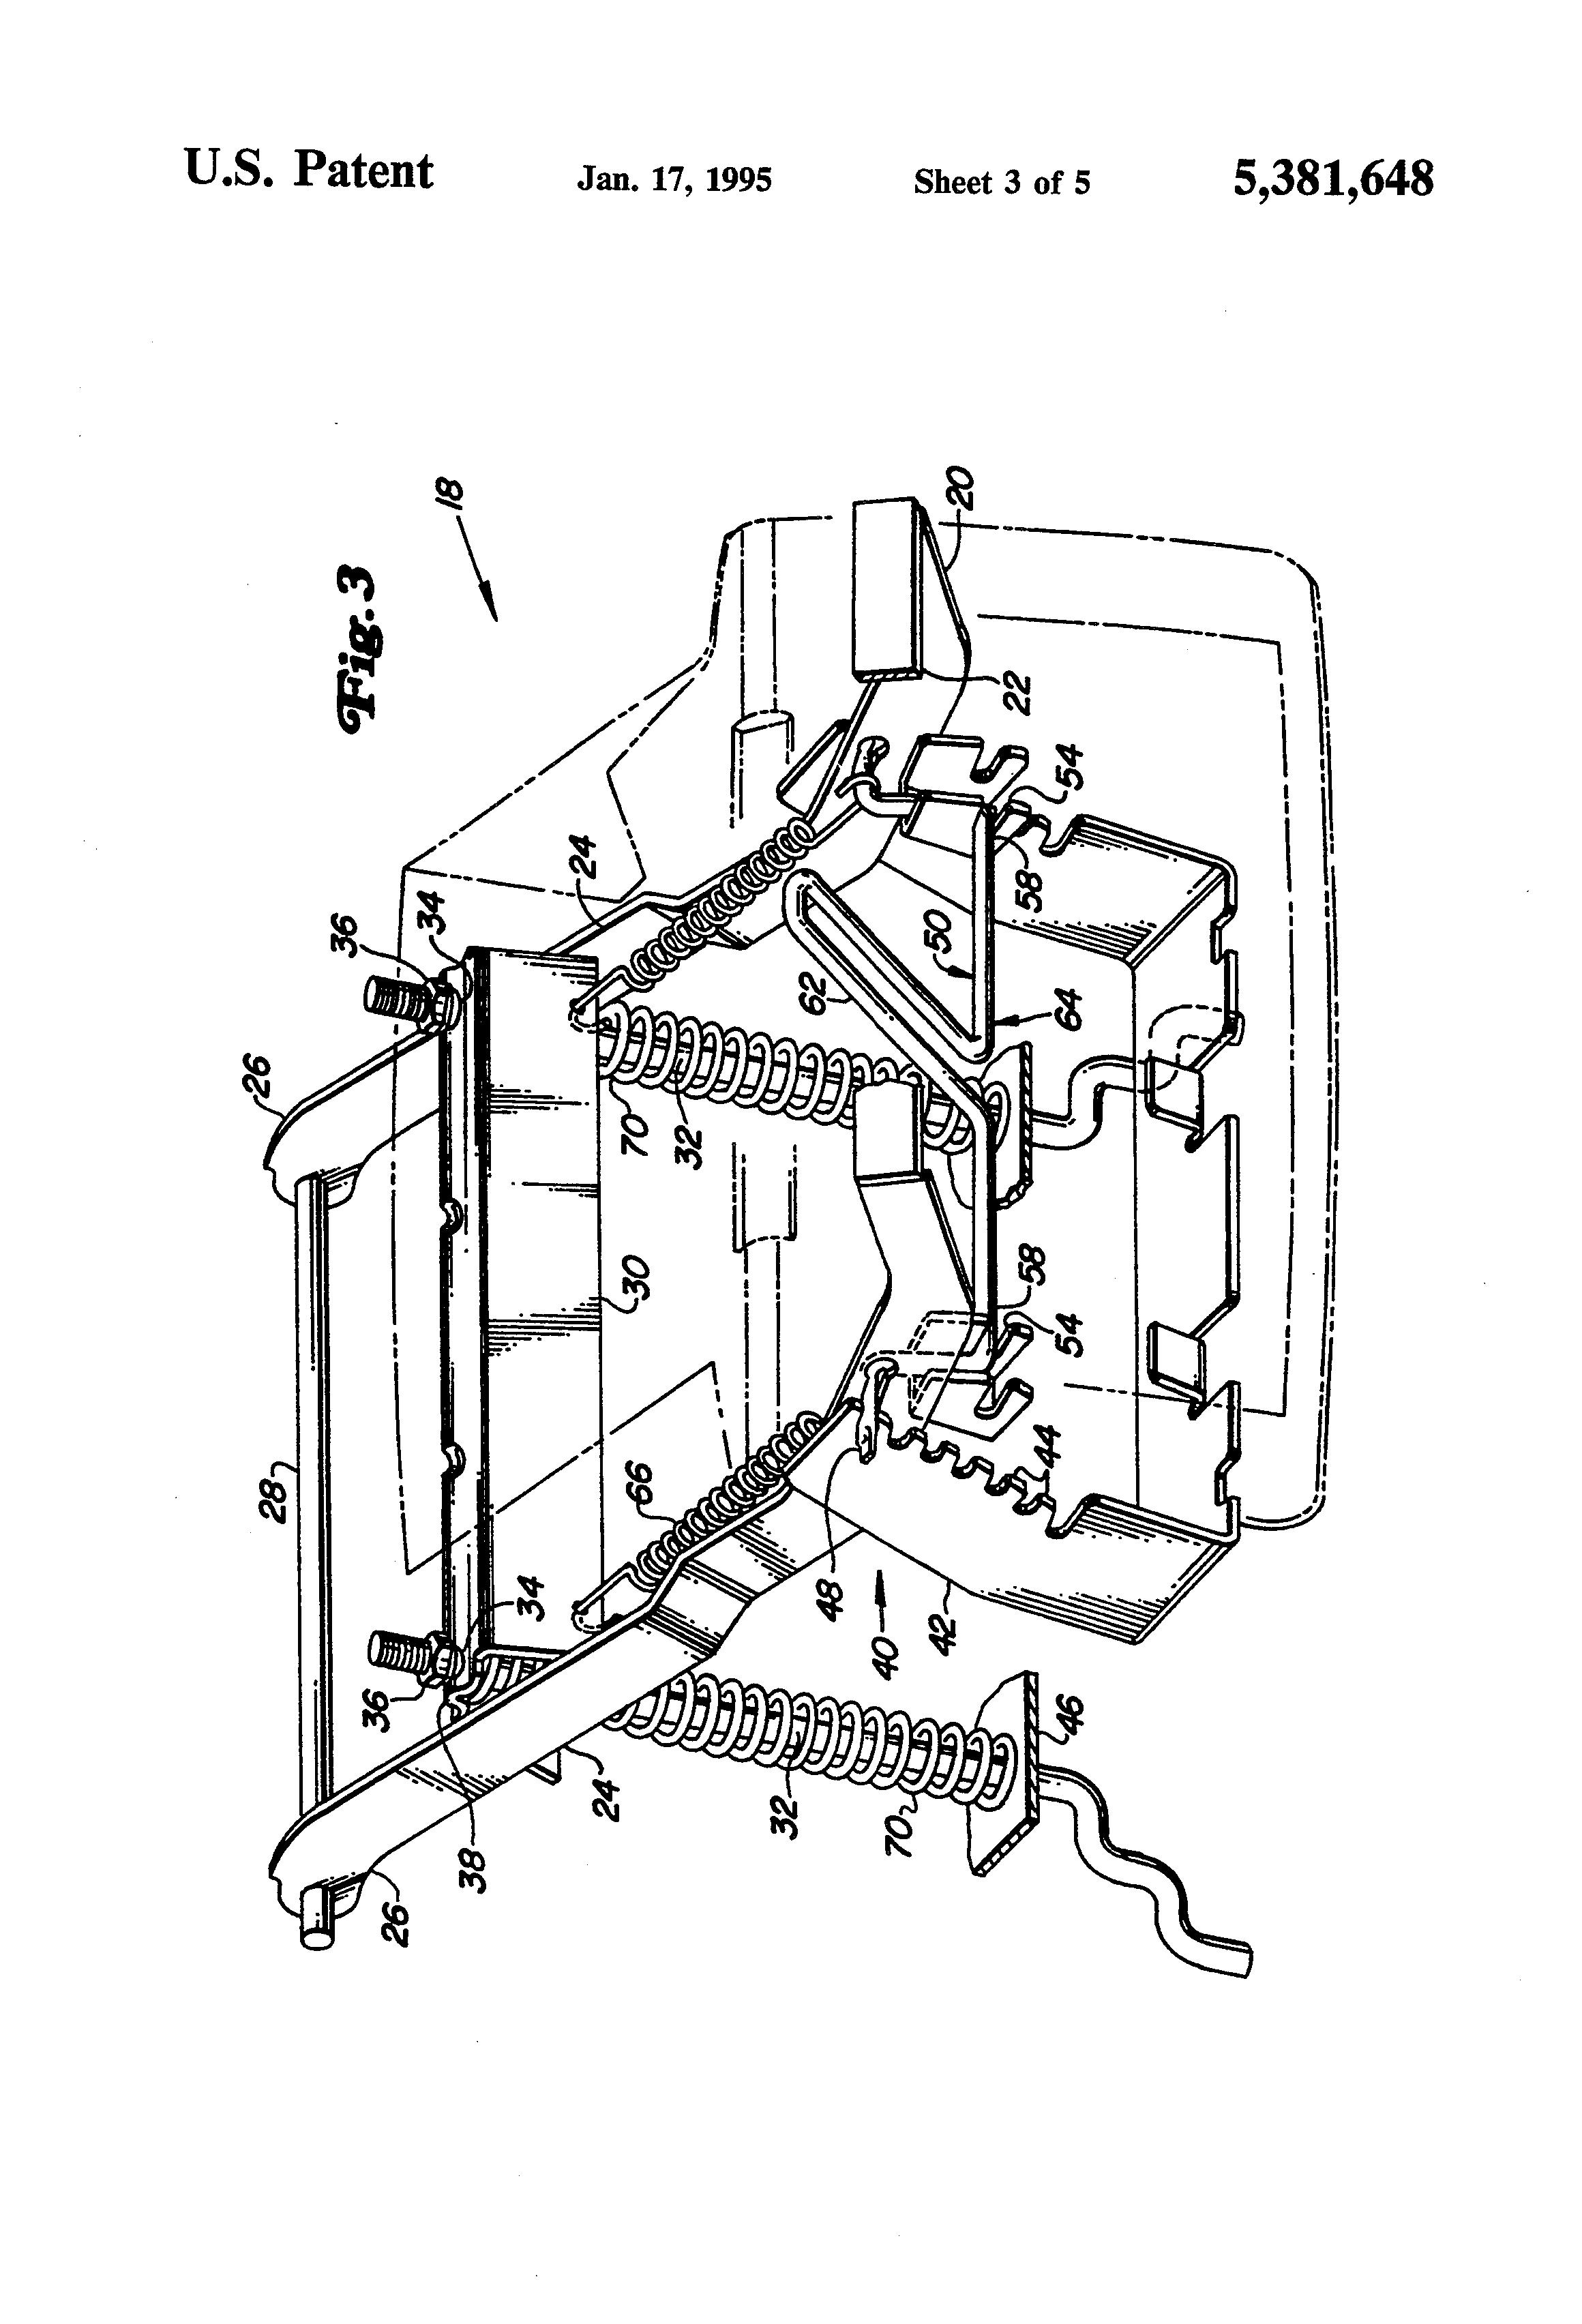 RV_3775] John Deere Ignition Module Moreover John Deere Gt235 Wiring Diagram  Download Diagram | Gx345 Wiring Diagram |  | Ricis Egre Mohammedshrine Librar Wiring 101